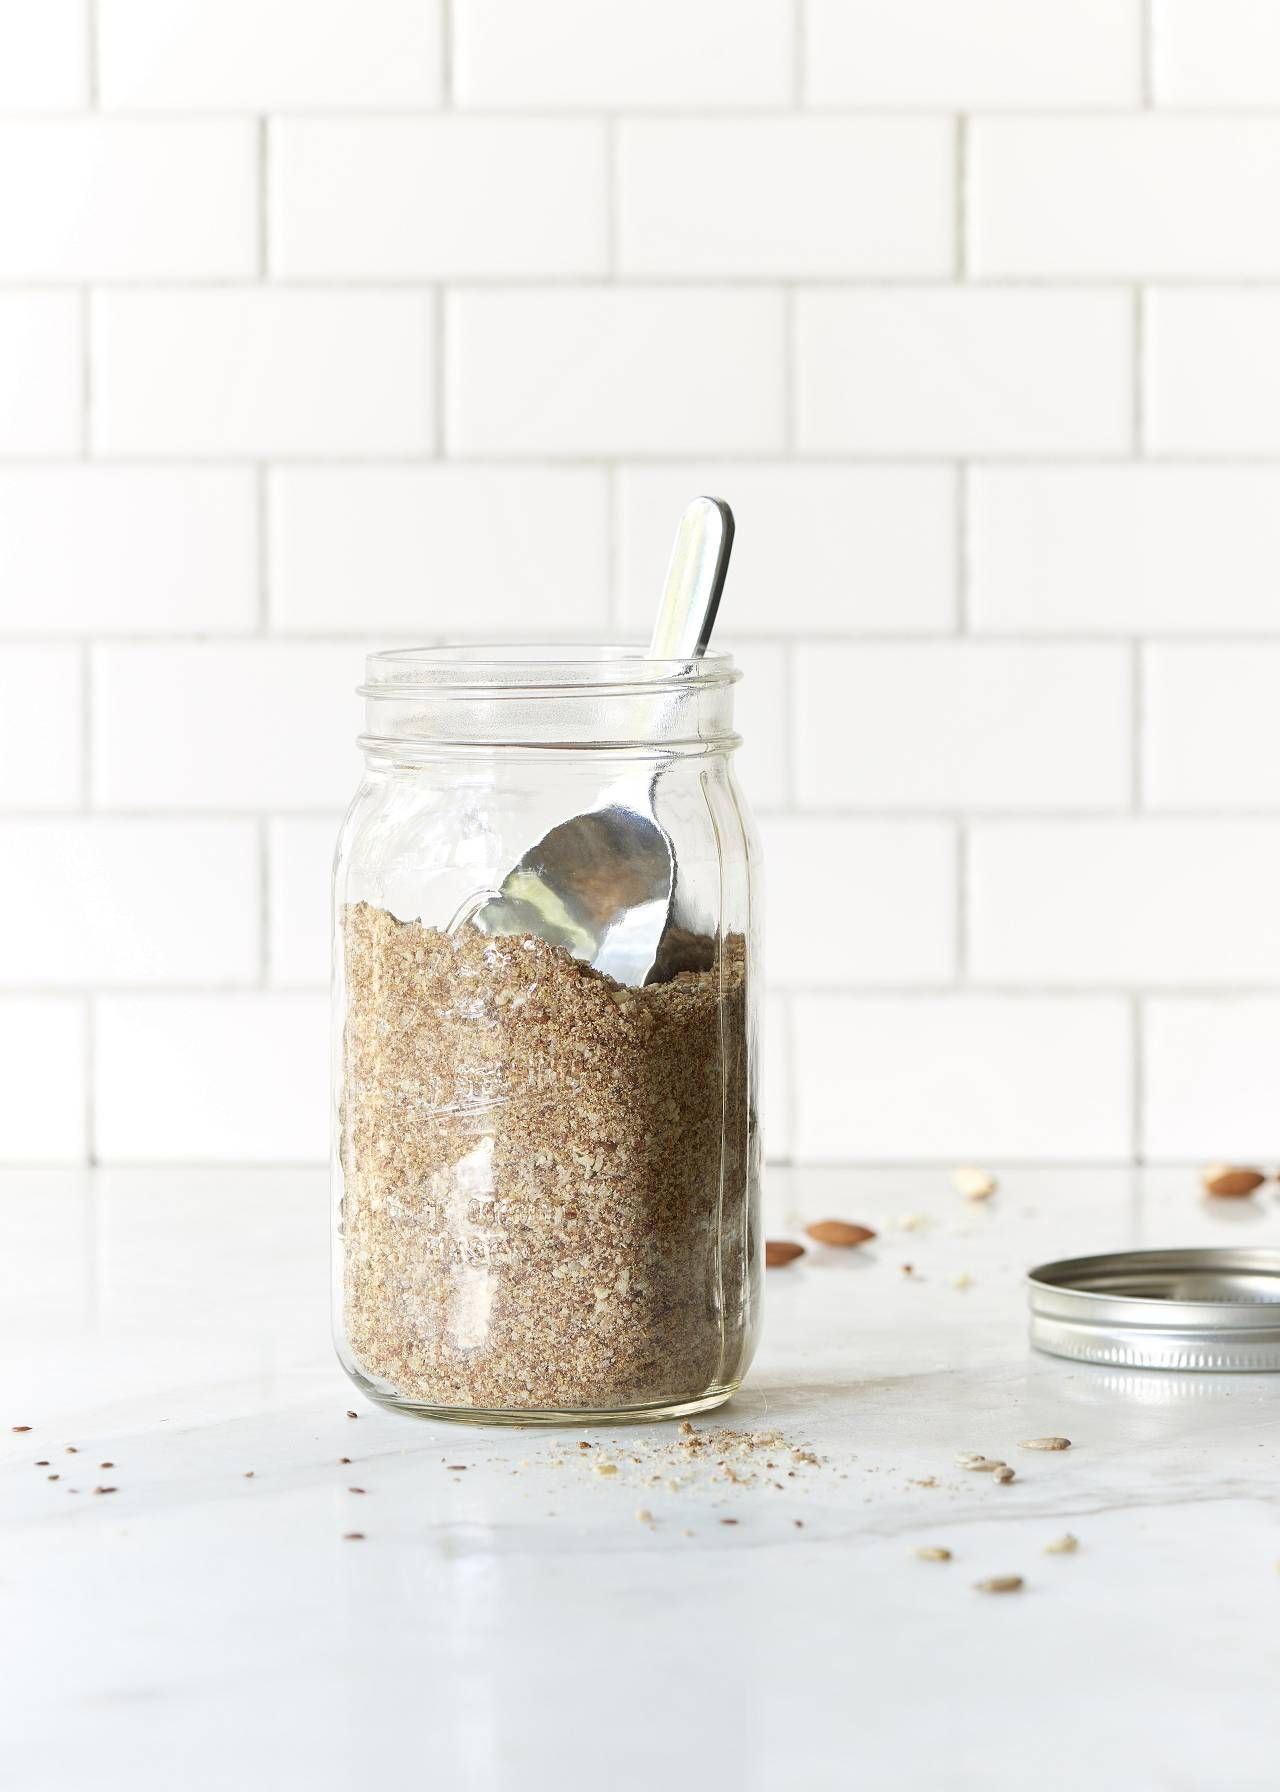 Homemade lsa make homemade lsa with raw almonds flax